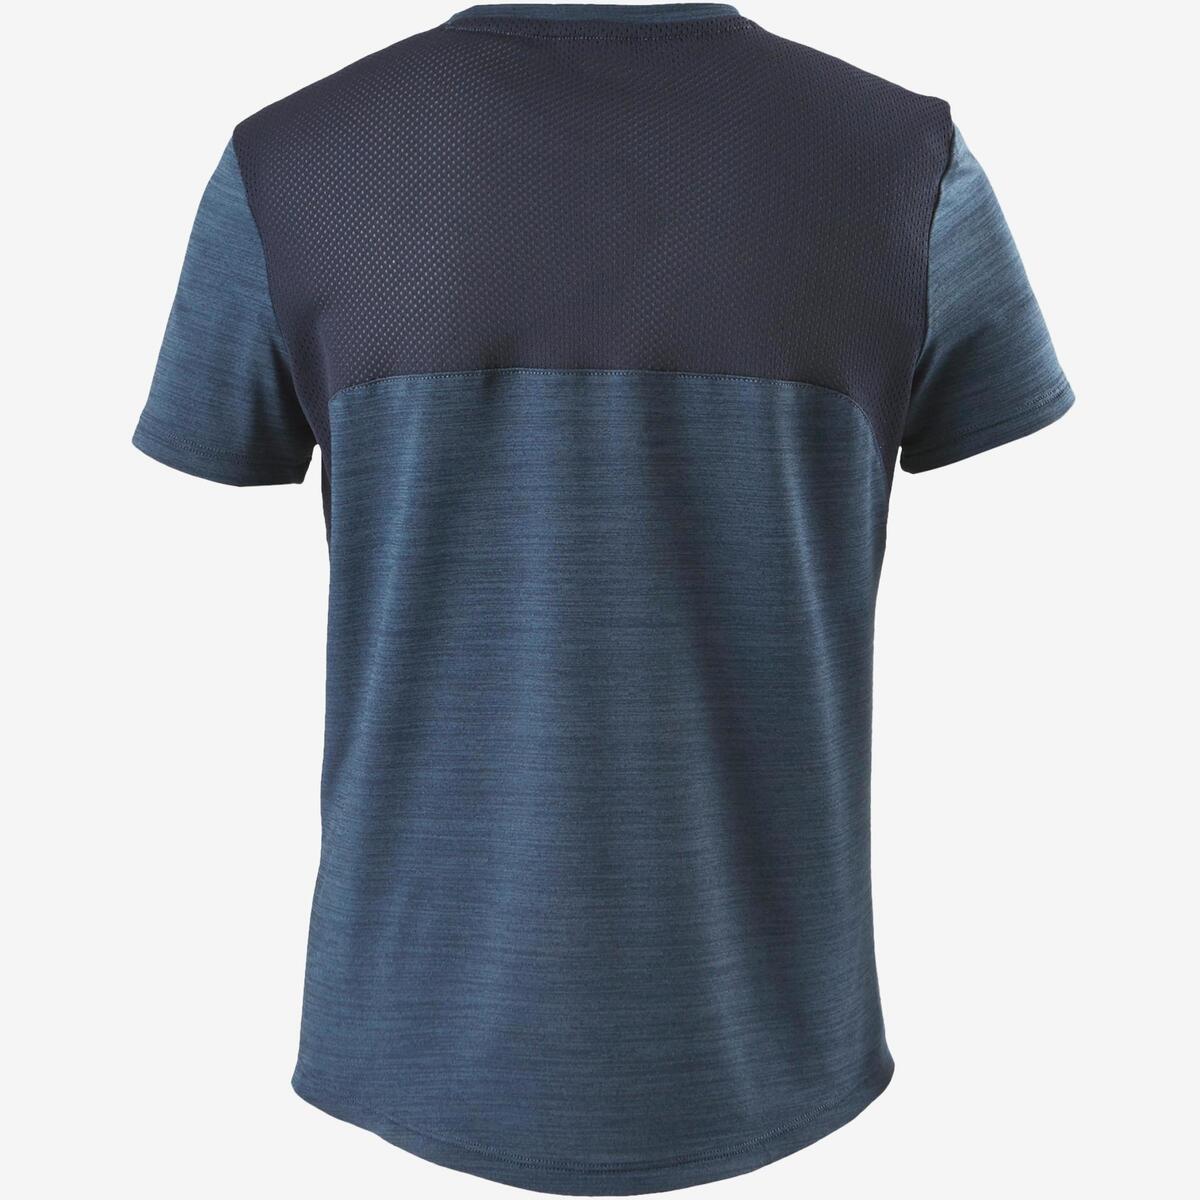 Bild 2 von T-Shirt Synthetik atmungsaktiv S500 Gym Kinder dunkelblau